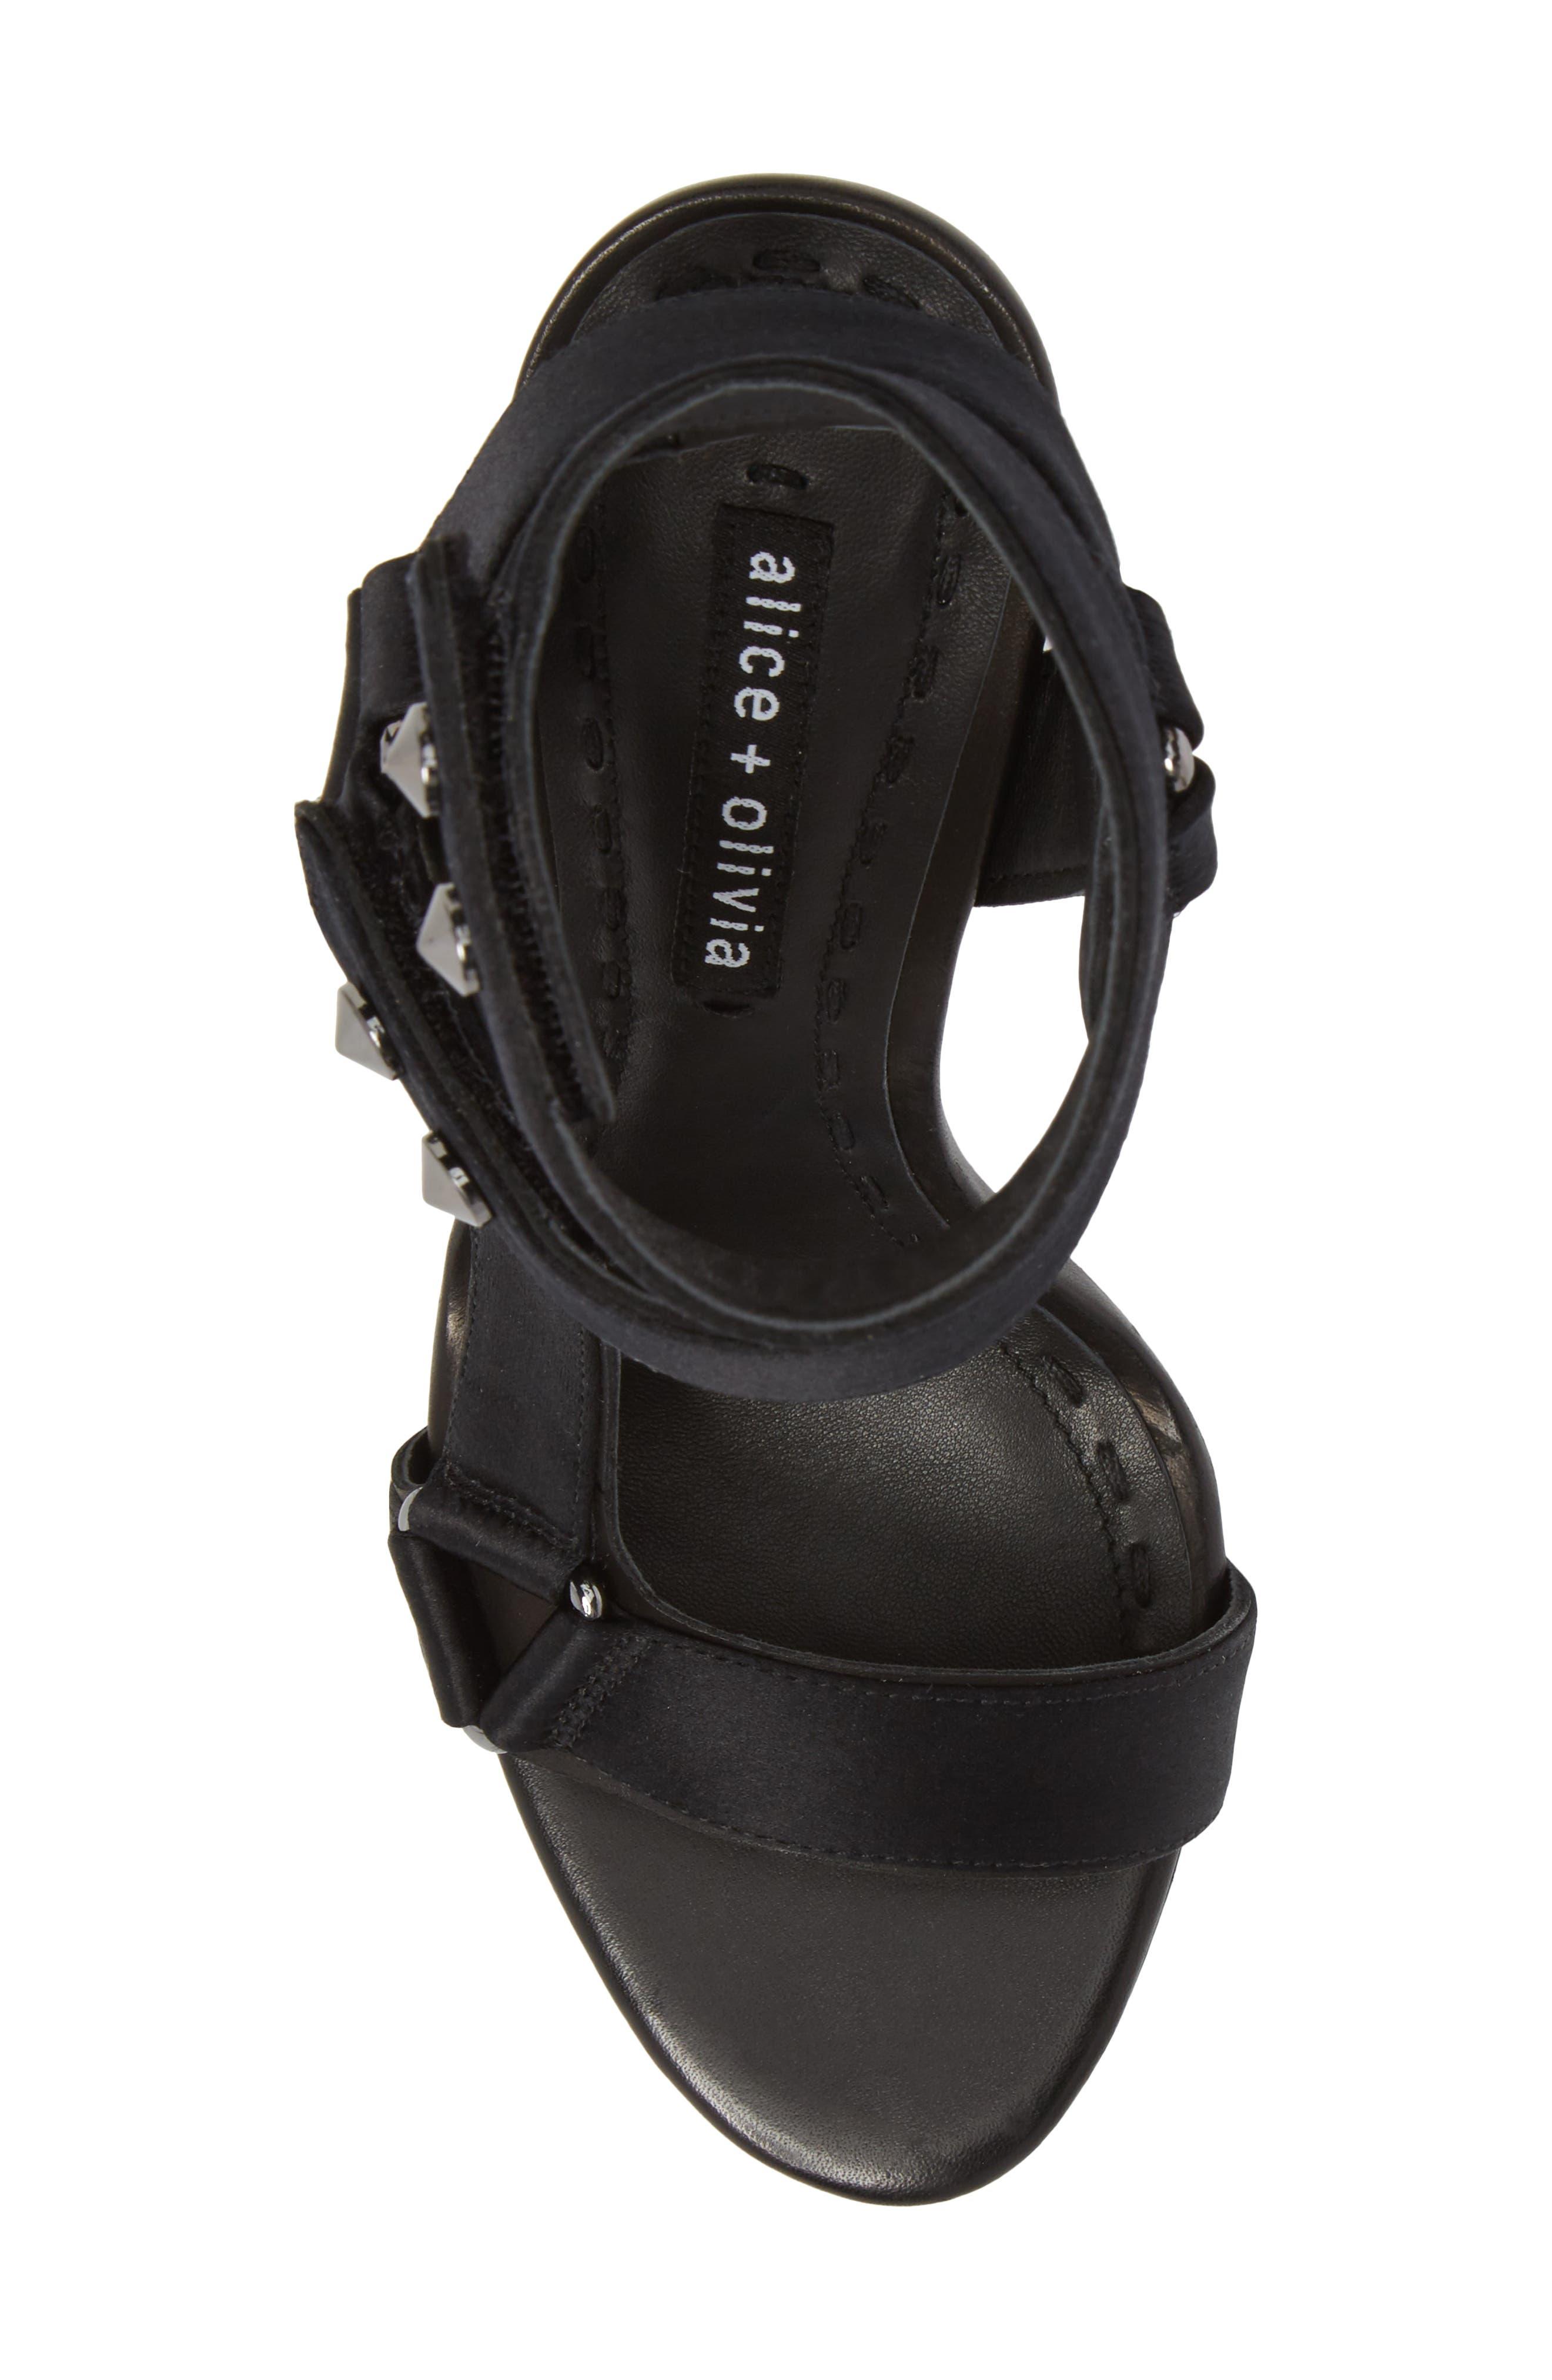 Tamryn Studded Ankle Strap Sandal,                             Alternate thumbnail 5, color,                             Black